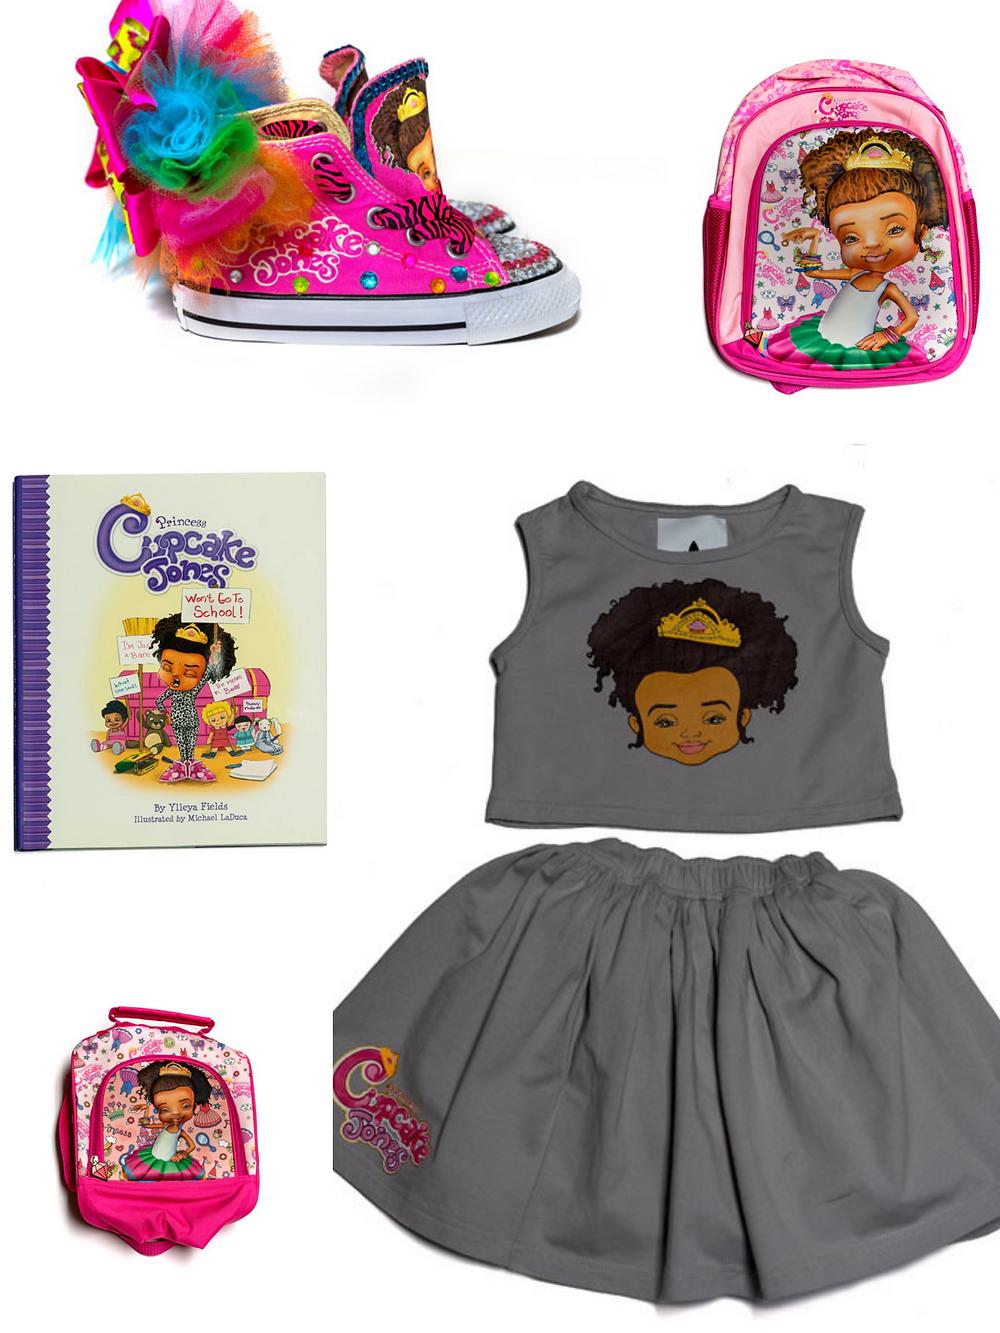 Princess Cupcake Jones, Black-owned children's book series and merchandise